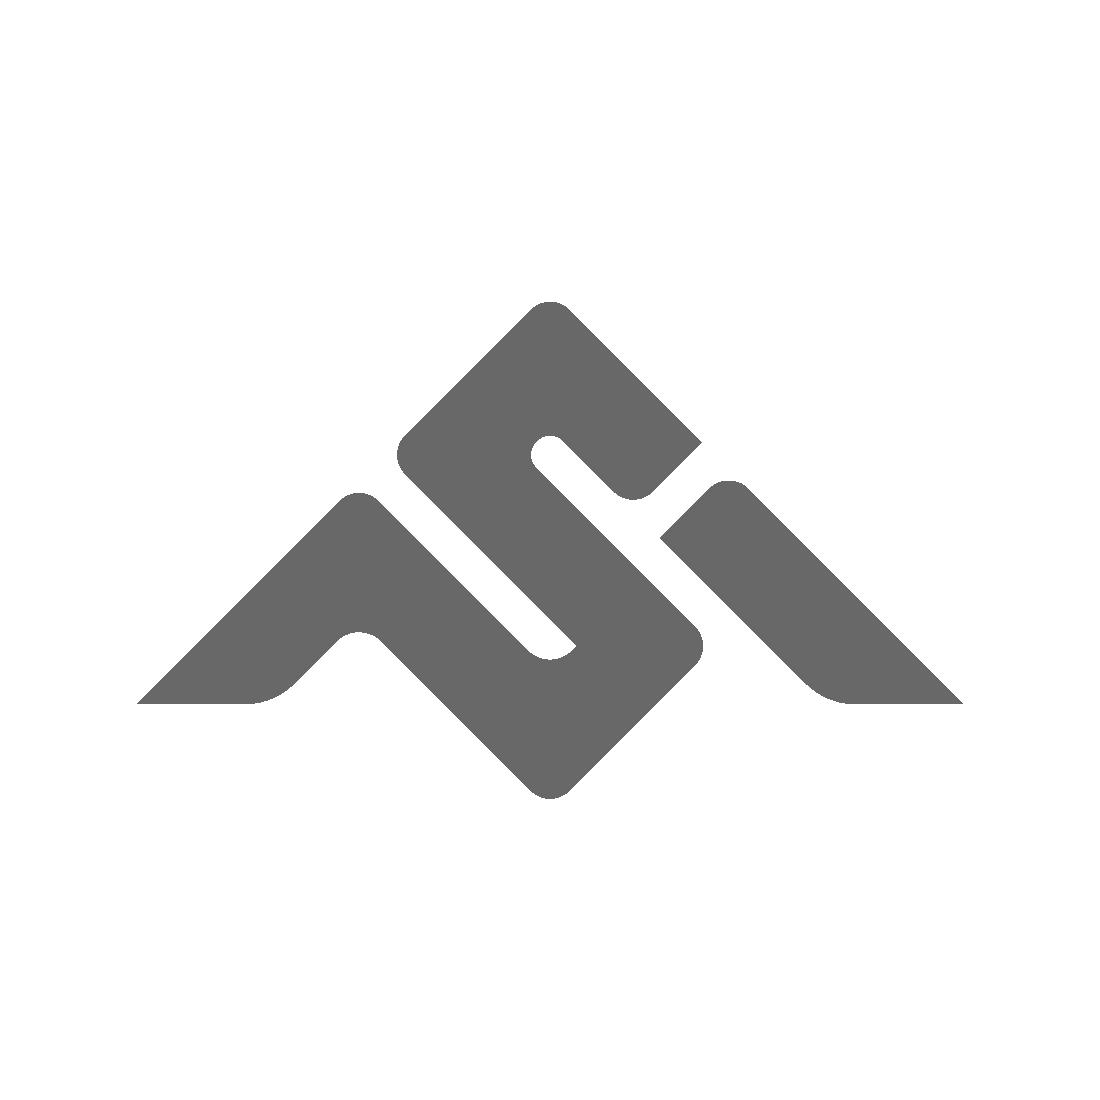 40e55ee48ae Powerslide SWELL Trinity 100 Voltage Blue fitness inline skate - buy ...